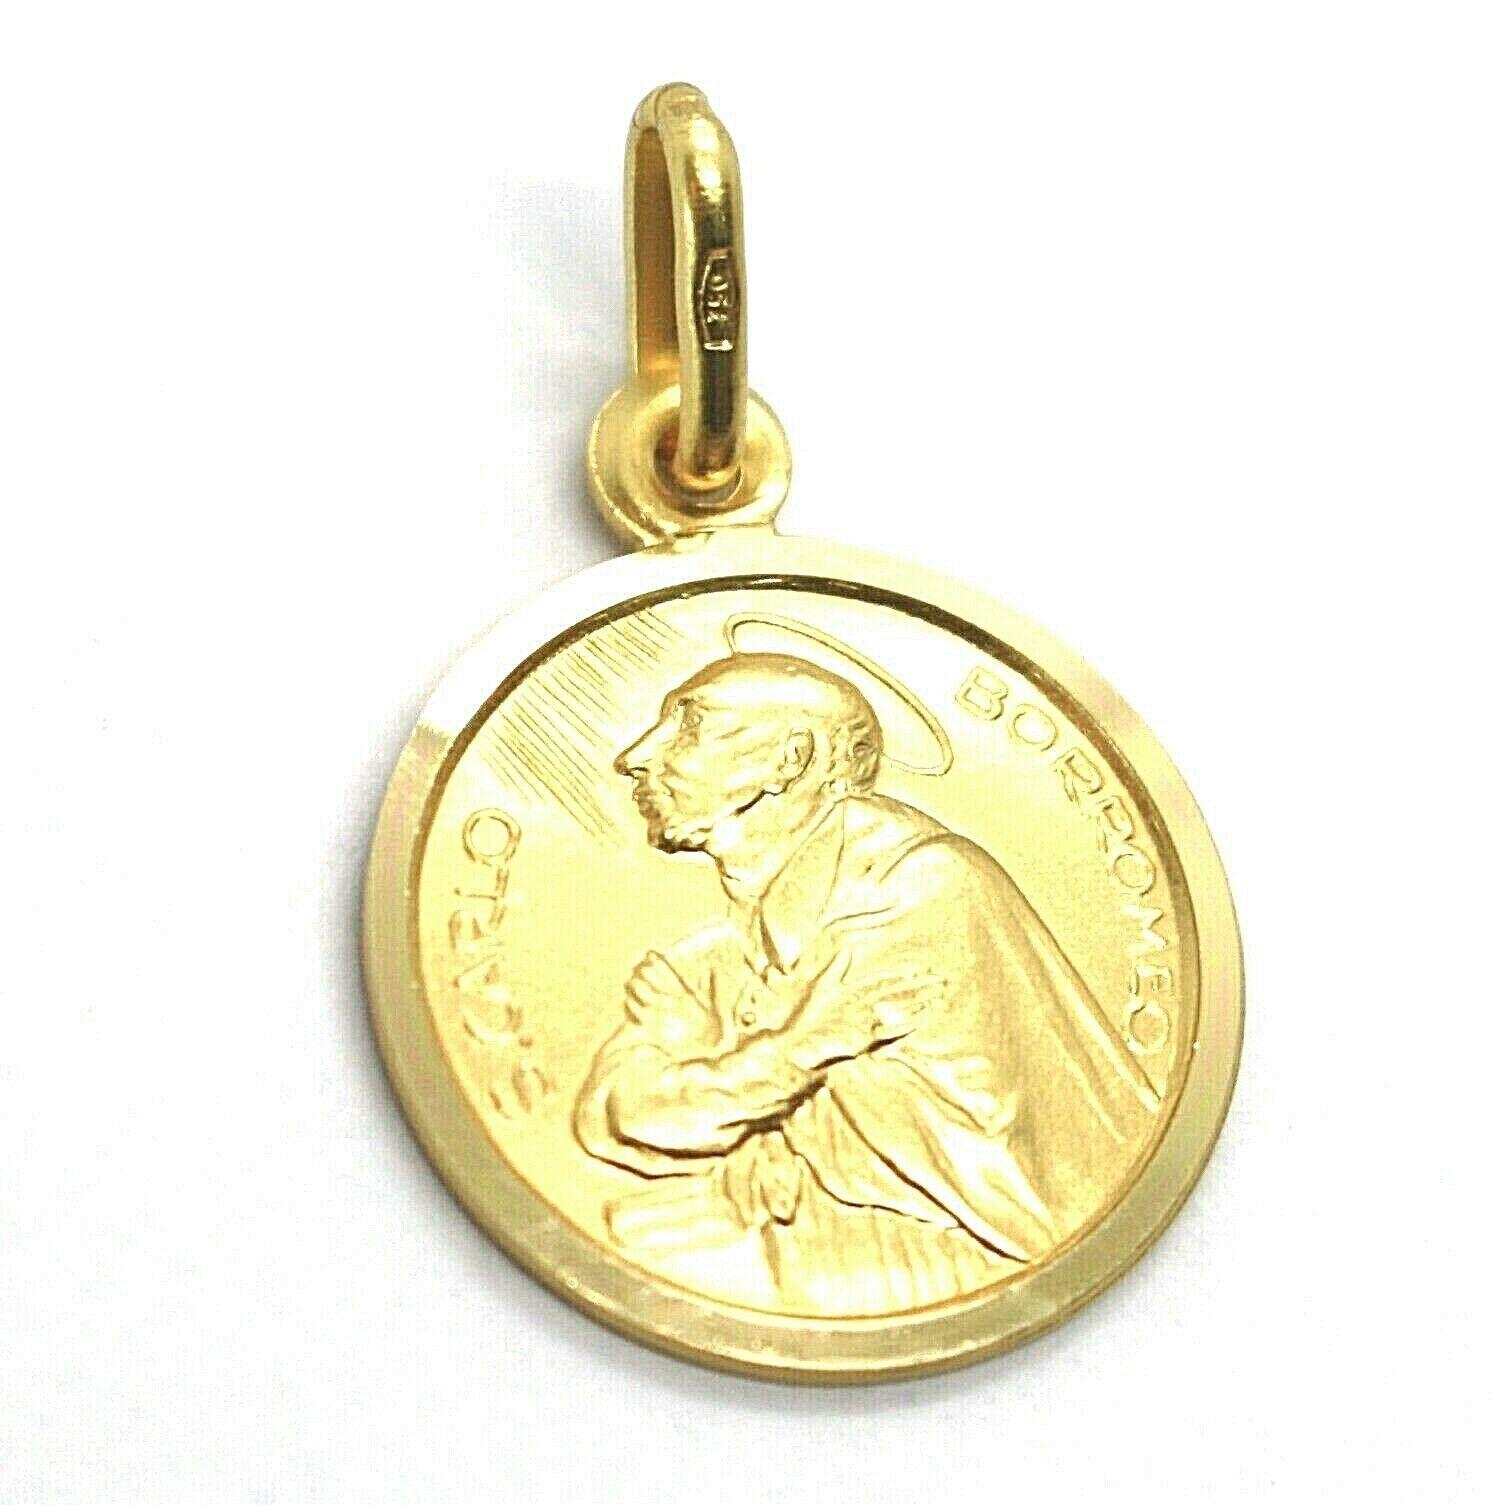 SOLID 18K YELLOW GOLD MEDAL, SAINT CARLO CHARLES BORROMEO, 15 mm DIAMETER